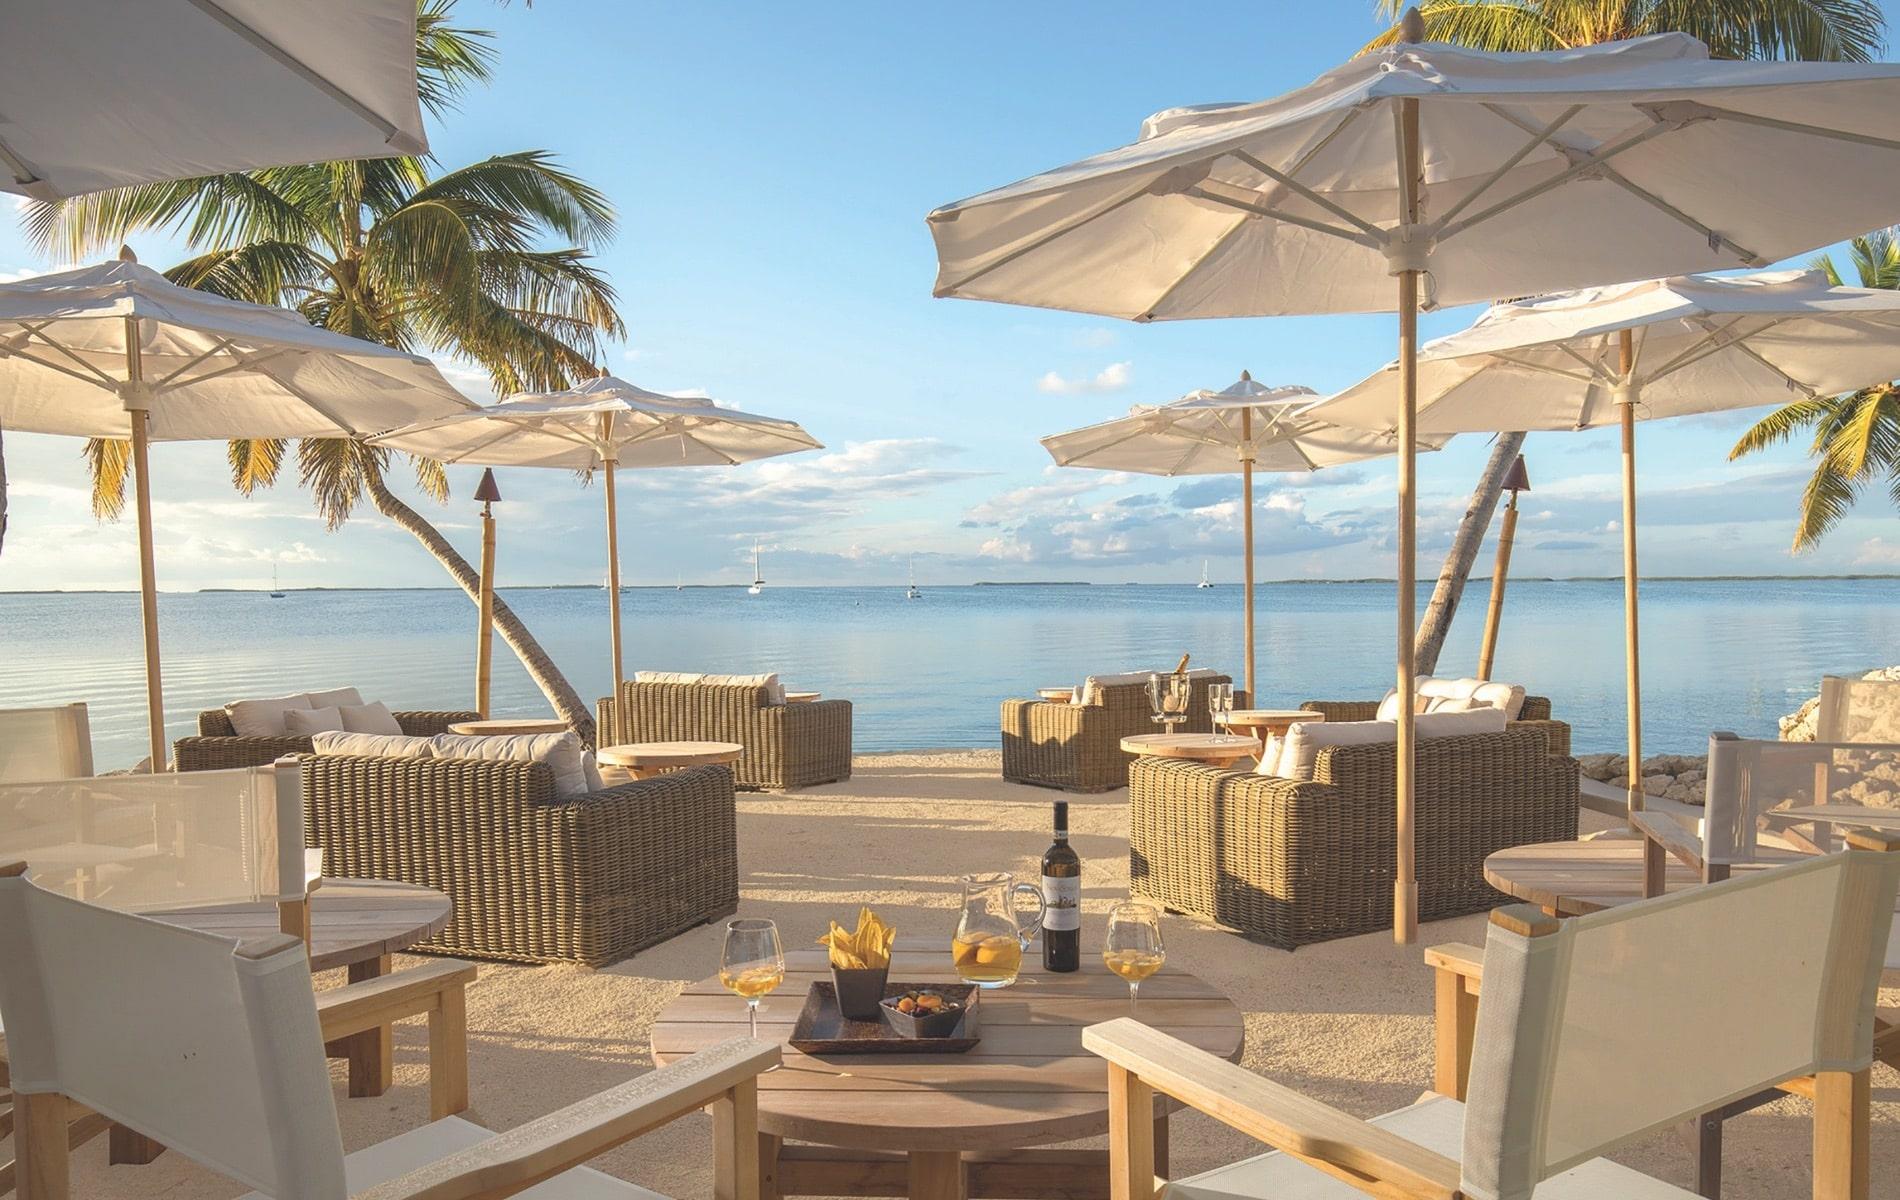 VIE Magazine January 2020 Travel Issue Au Revoir Department Page, Key Largo Resort